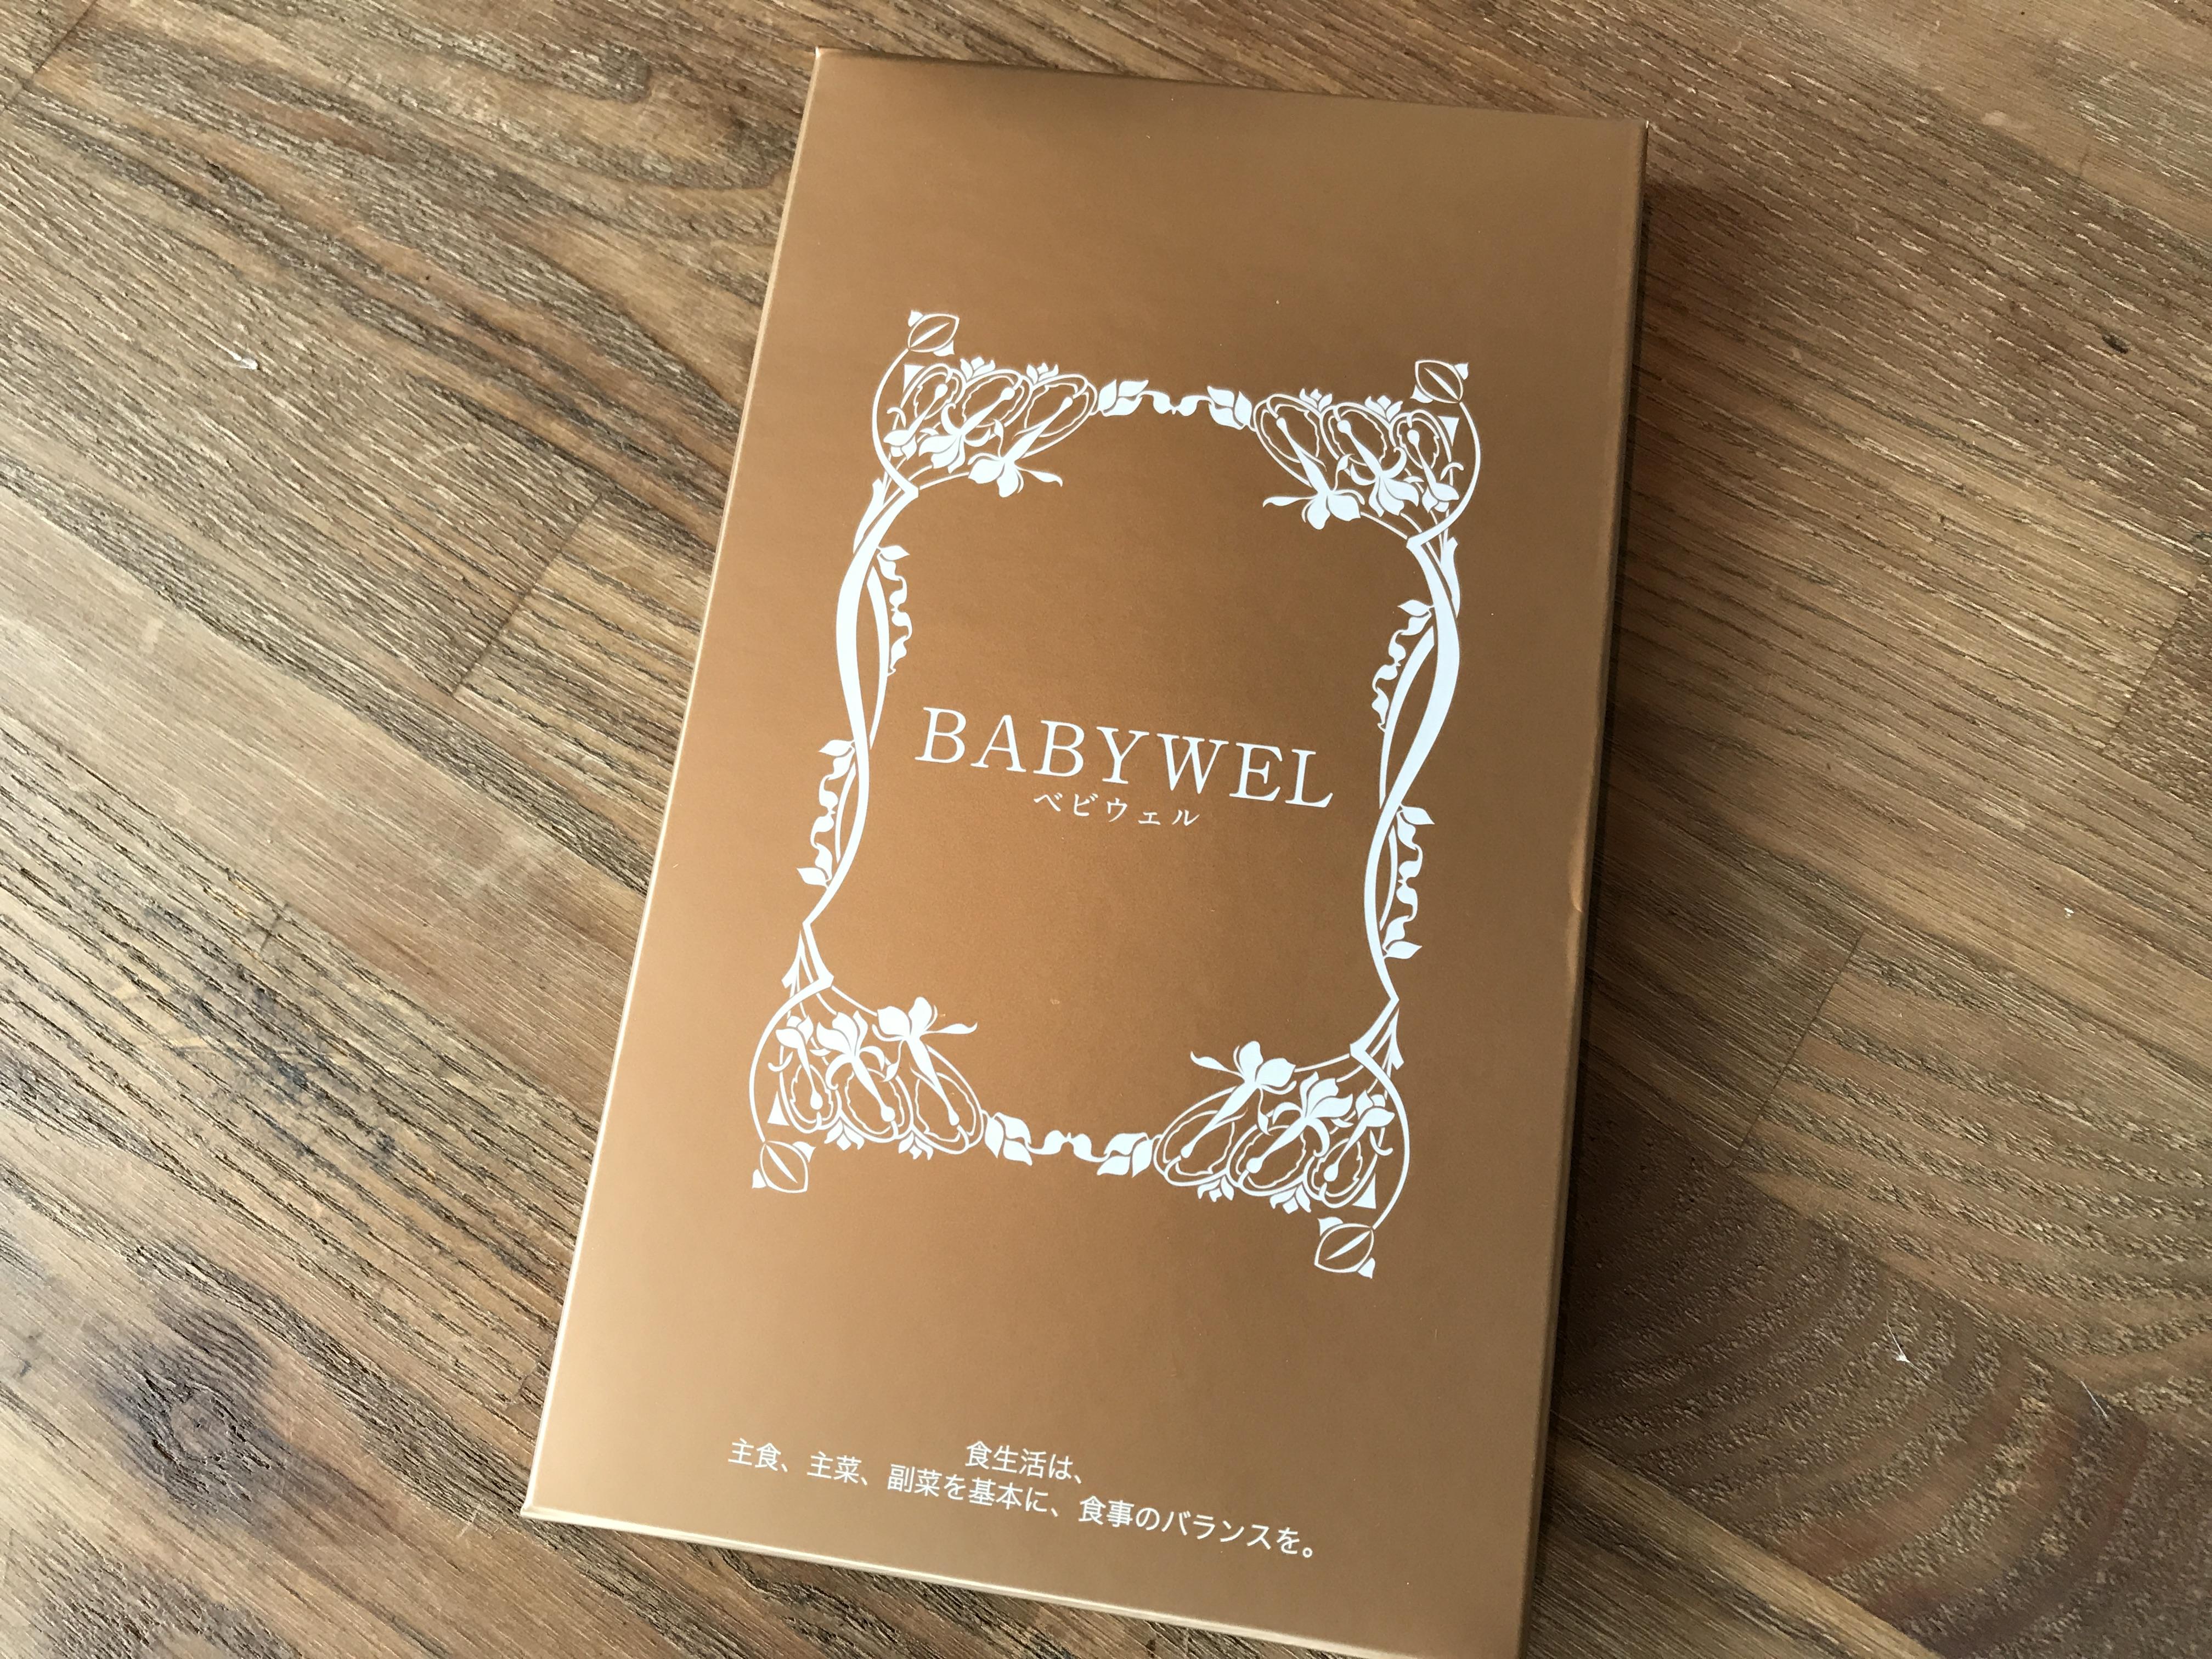 BABYWEL(ベビウェル)はオシャレな箱入り